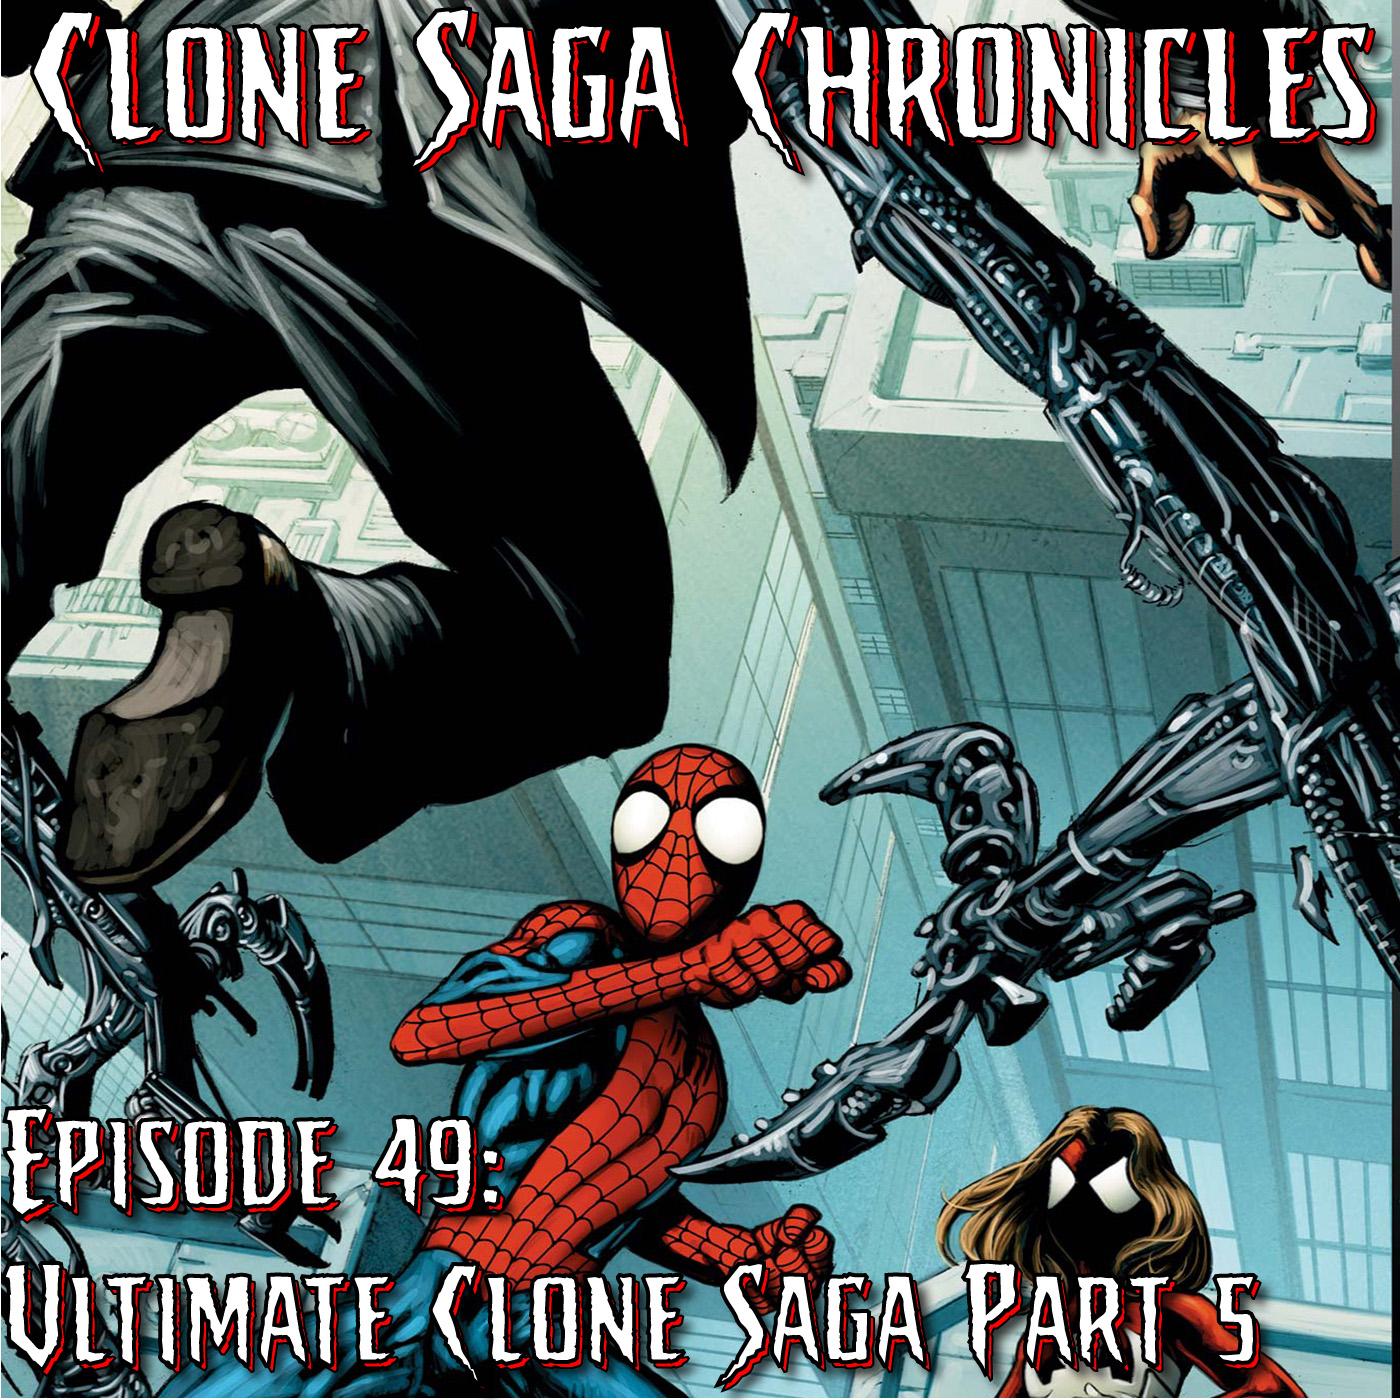 CSC Episode 49: Ultimate Clone Saga Part 5